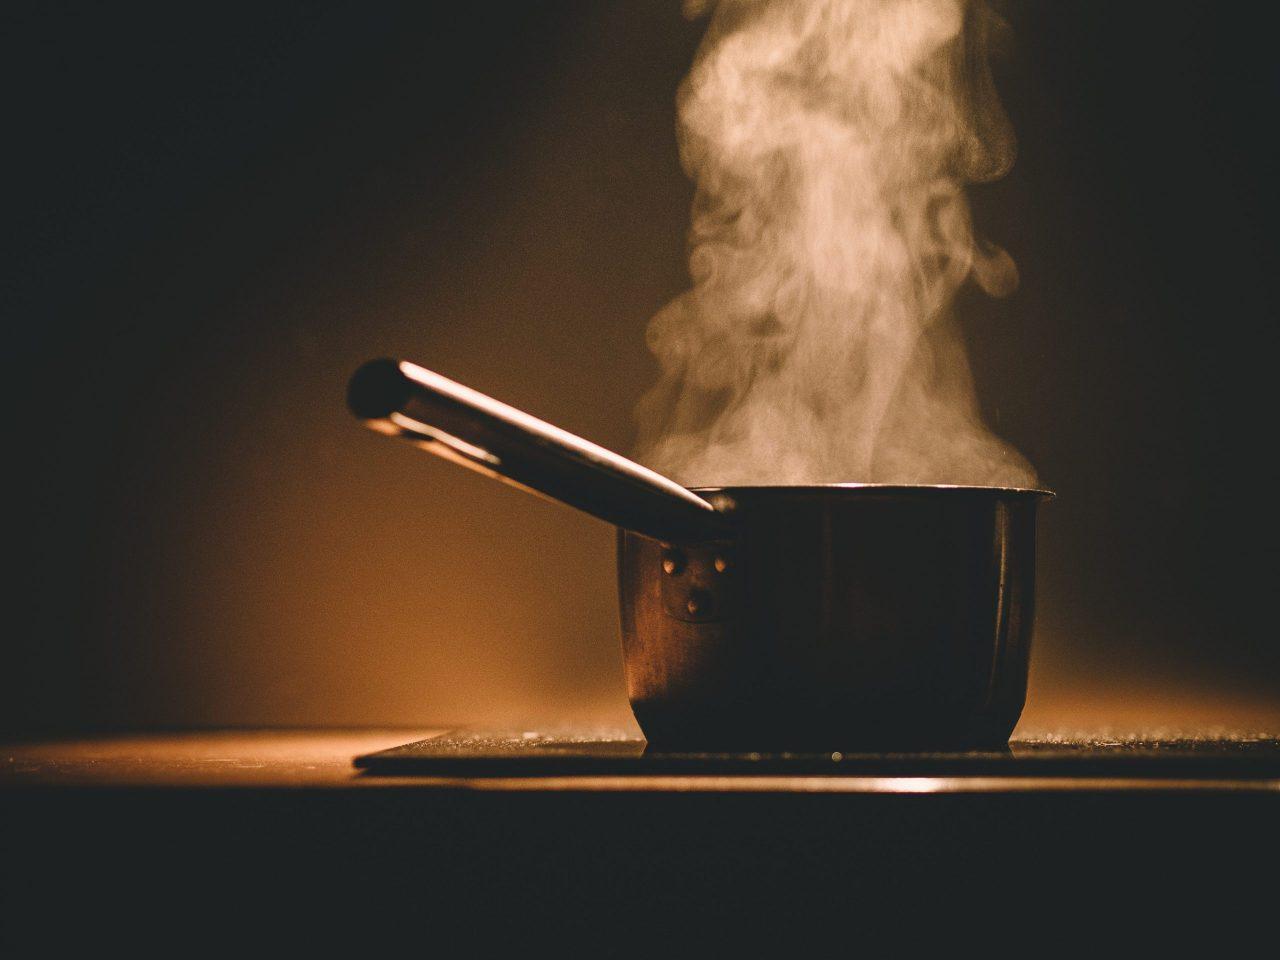 How to Make a Delicious Easy Vegan Gravy